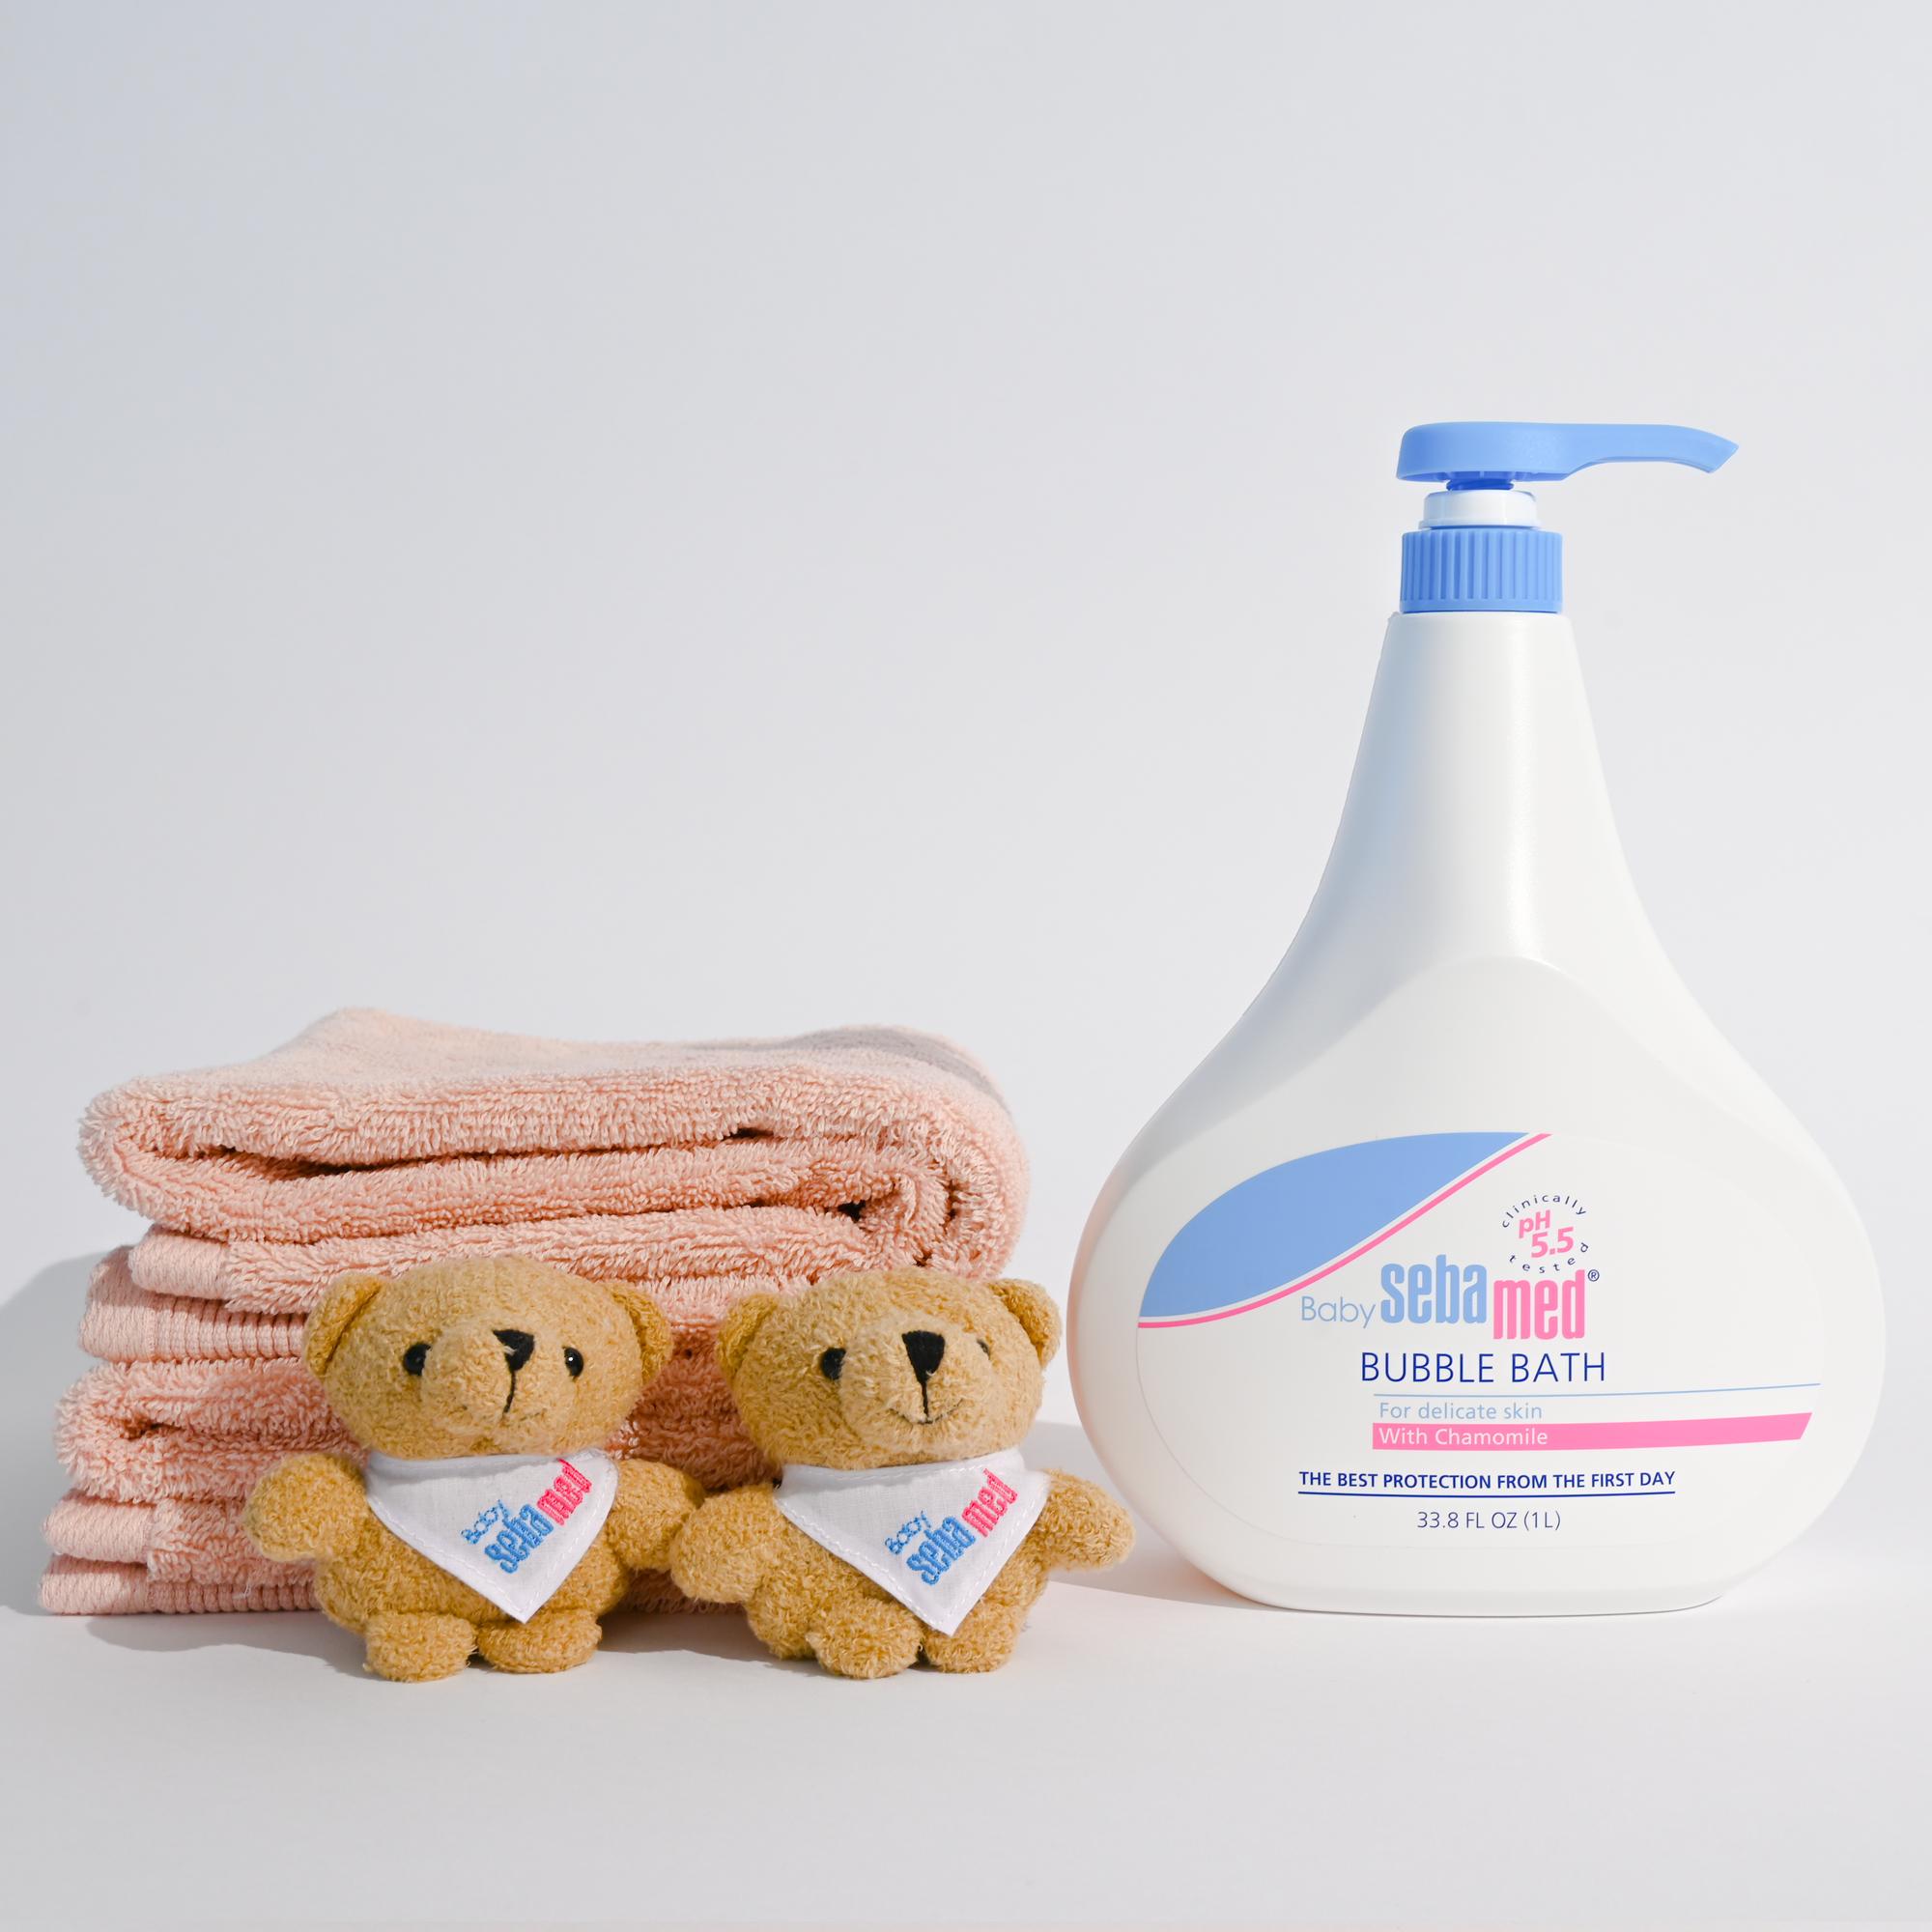 Baby bubblebath and bear %281%29